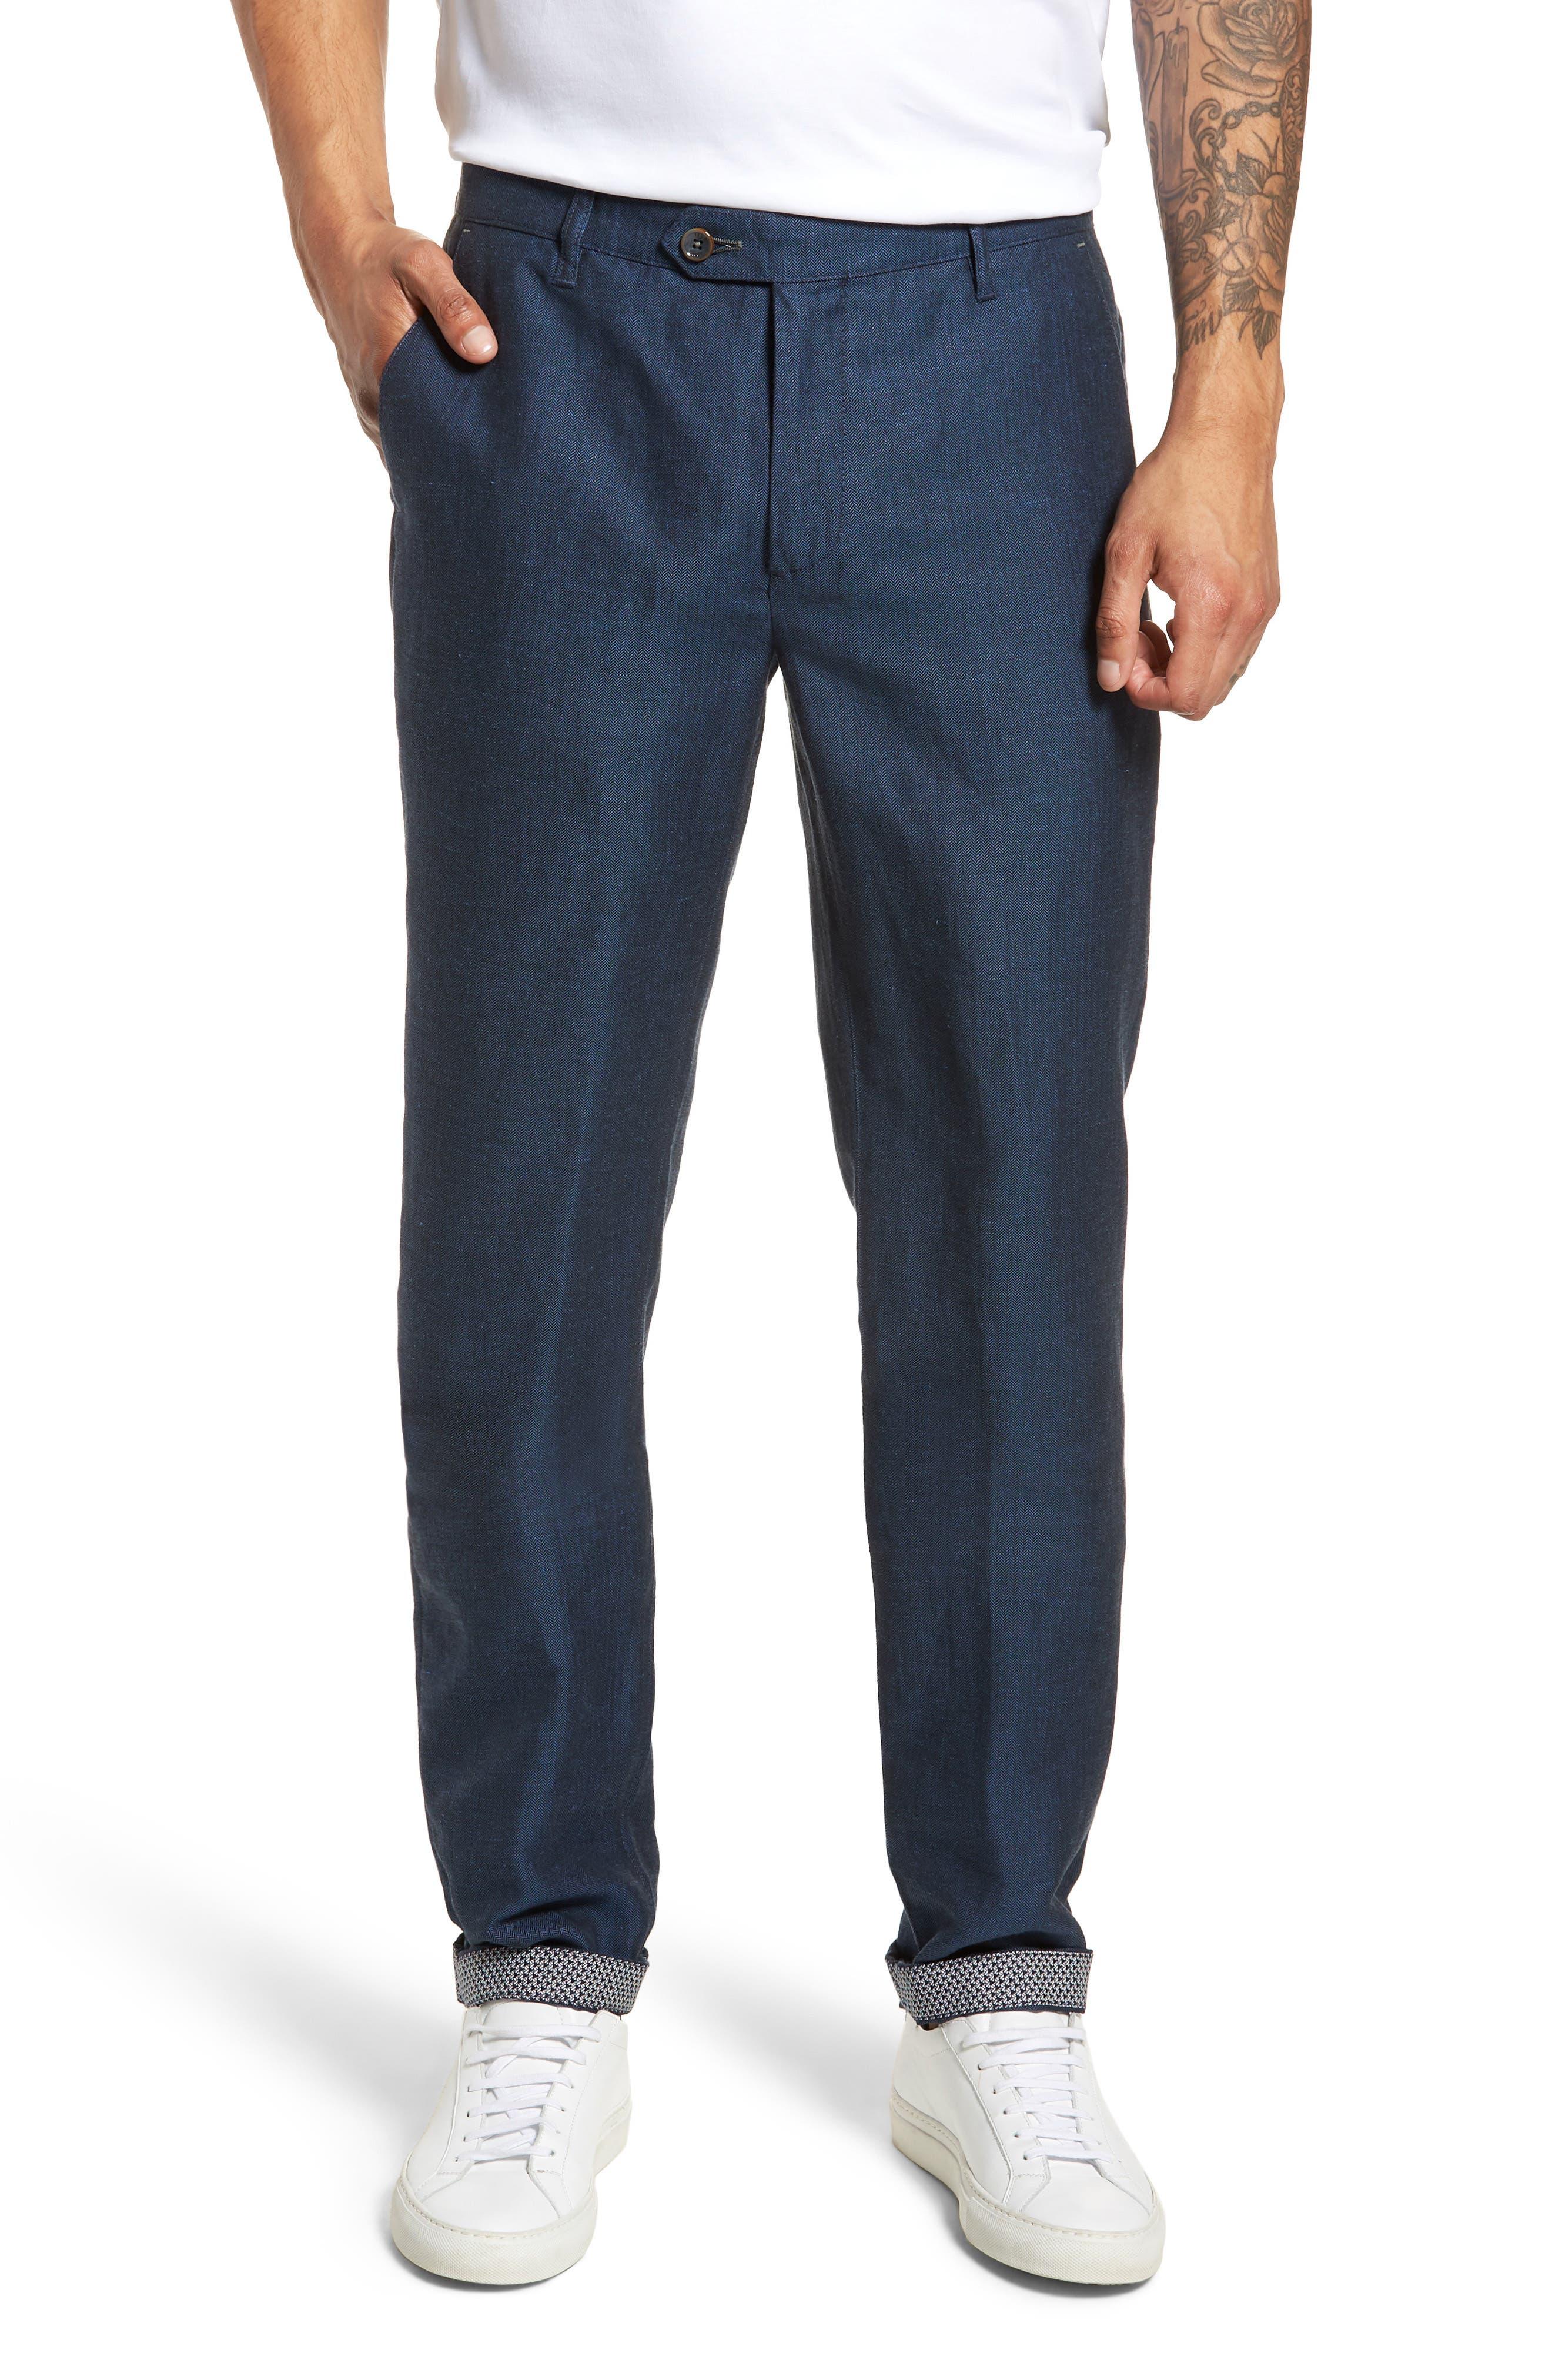 Cazzman Flat Front Stretch Pants,                         Main,                         color, Navy